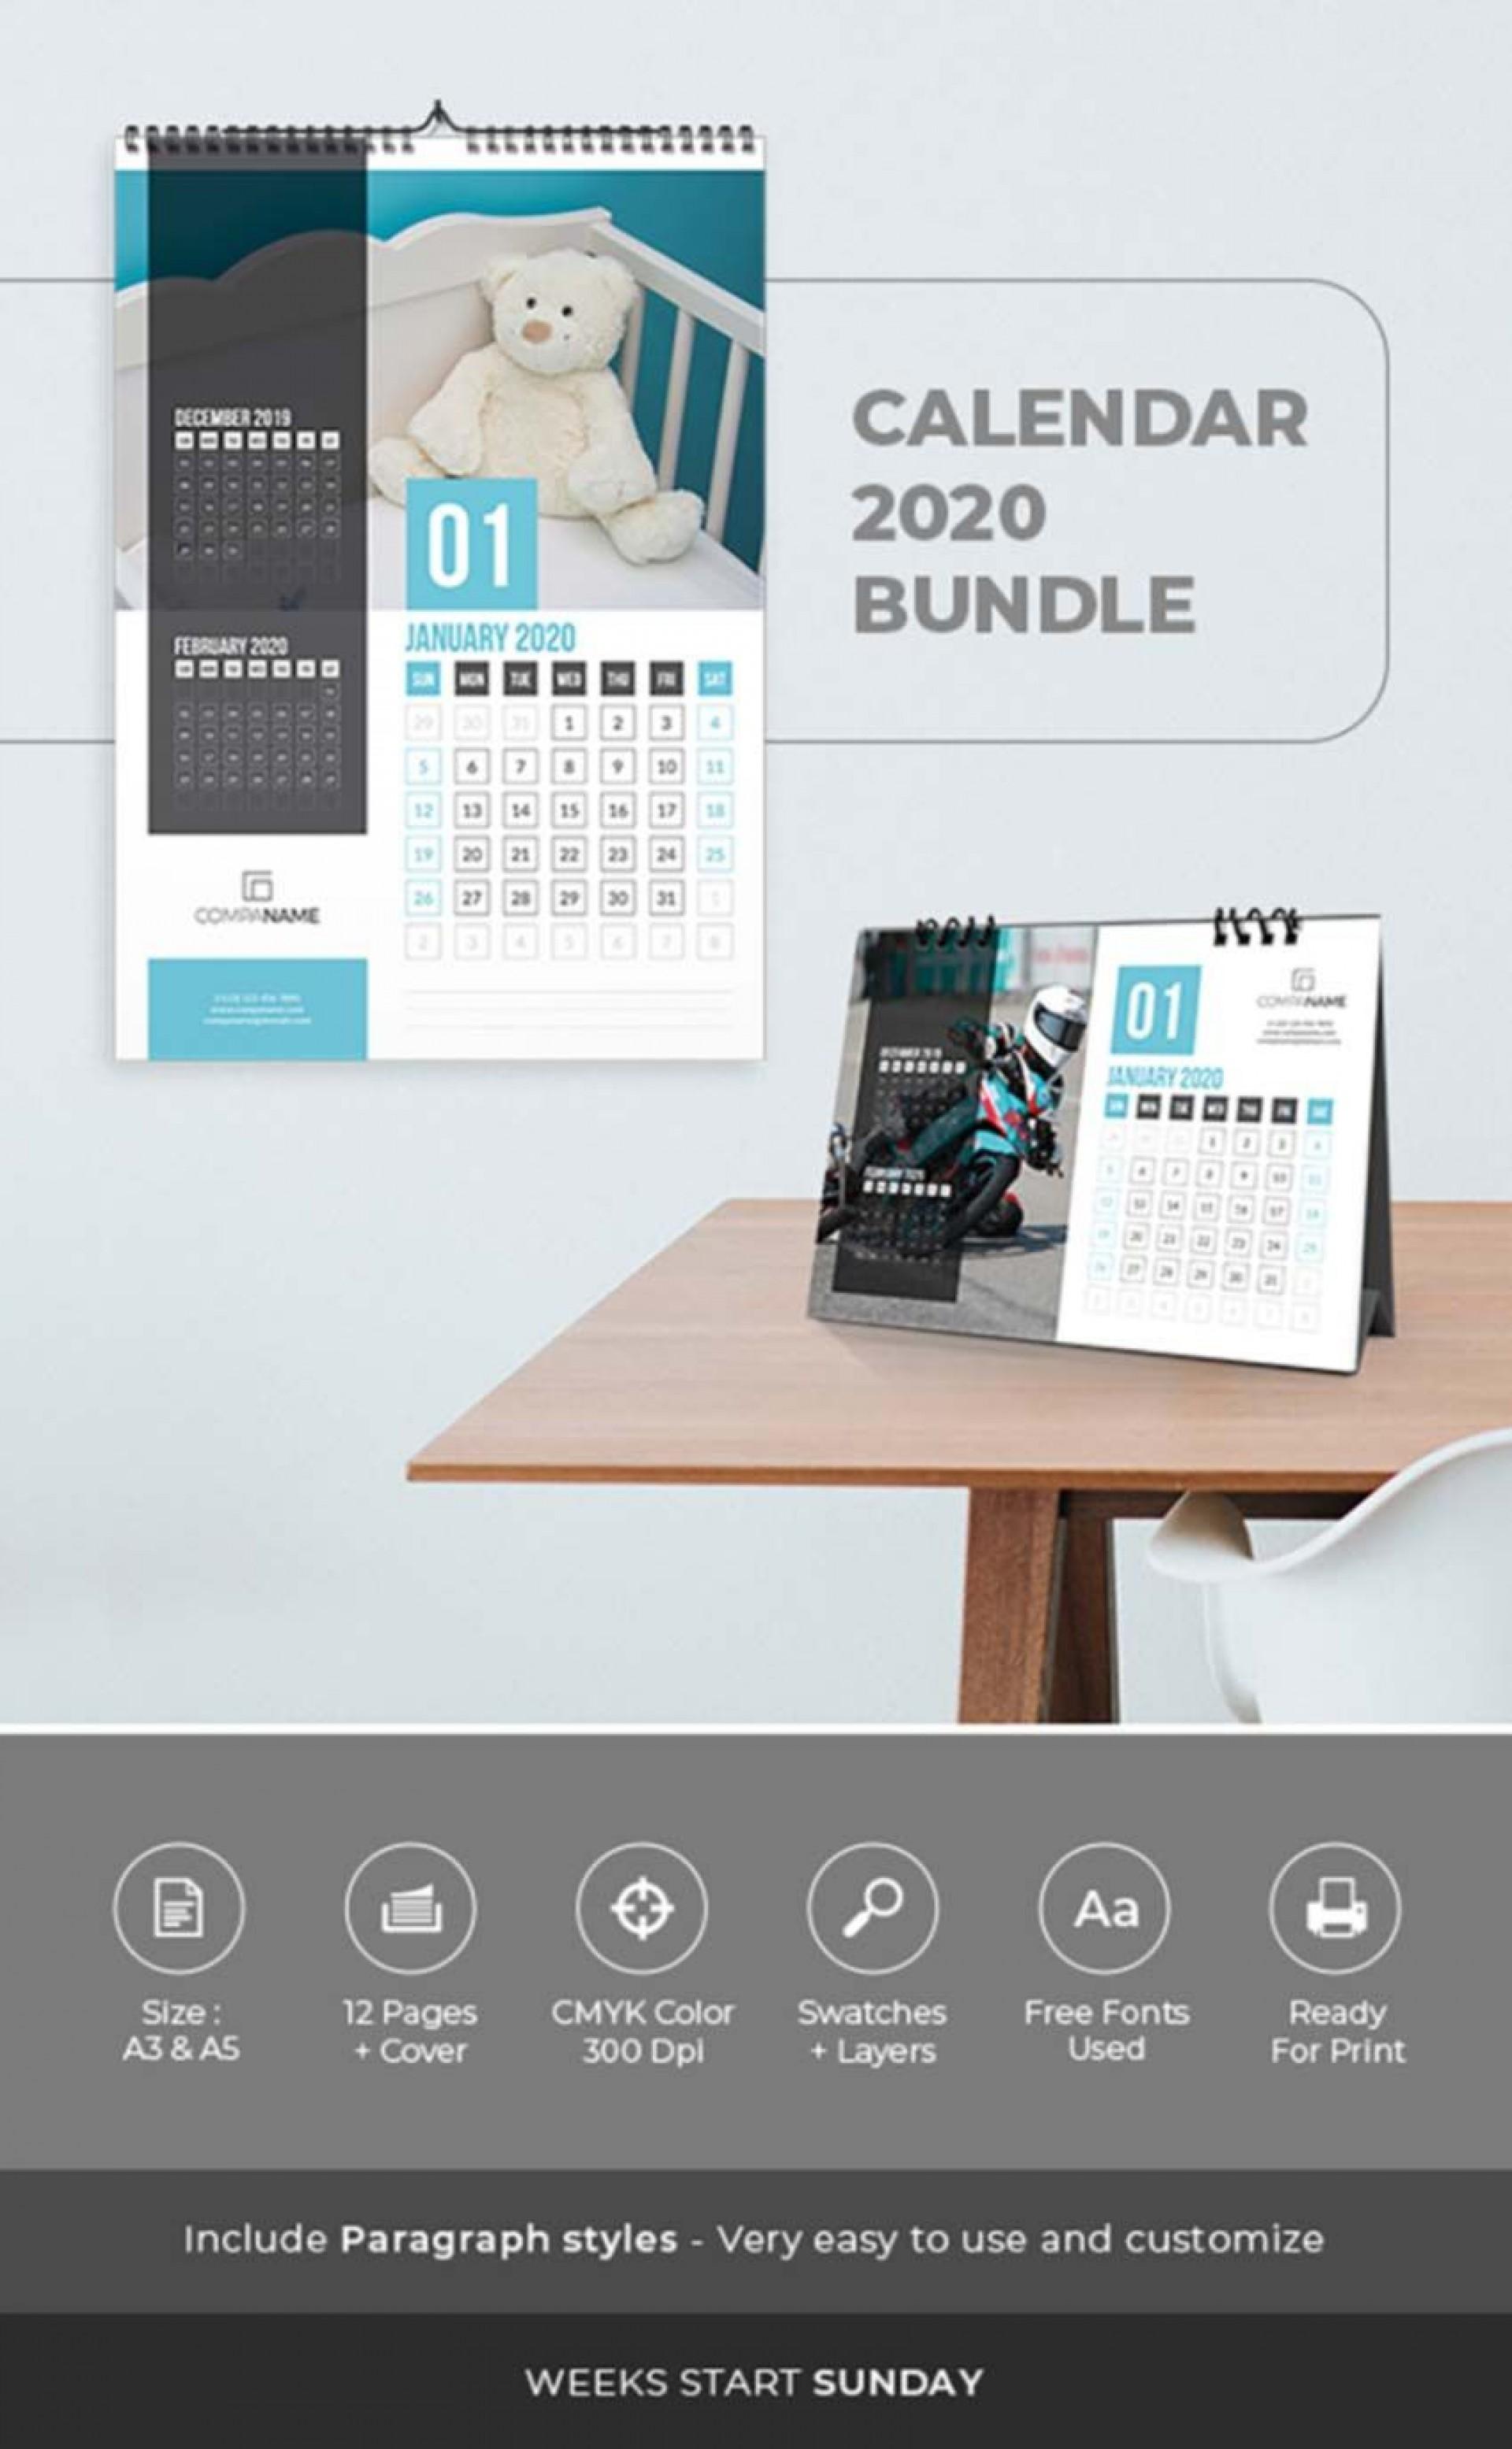 005 Shocking 2020 Calendar Template Indesign High Def  Adobe Free1920